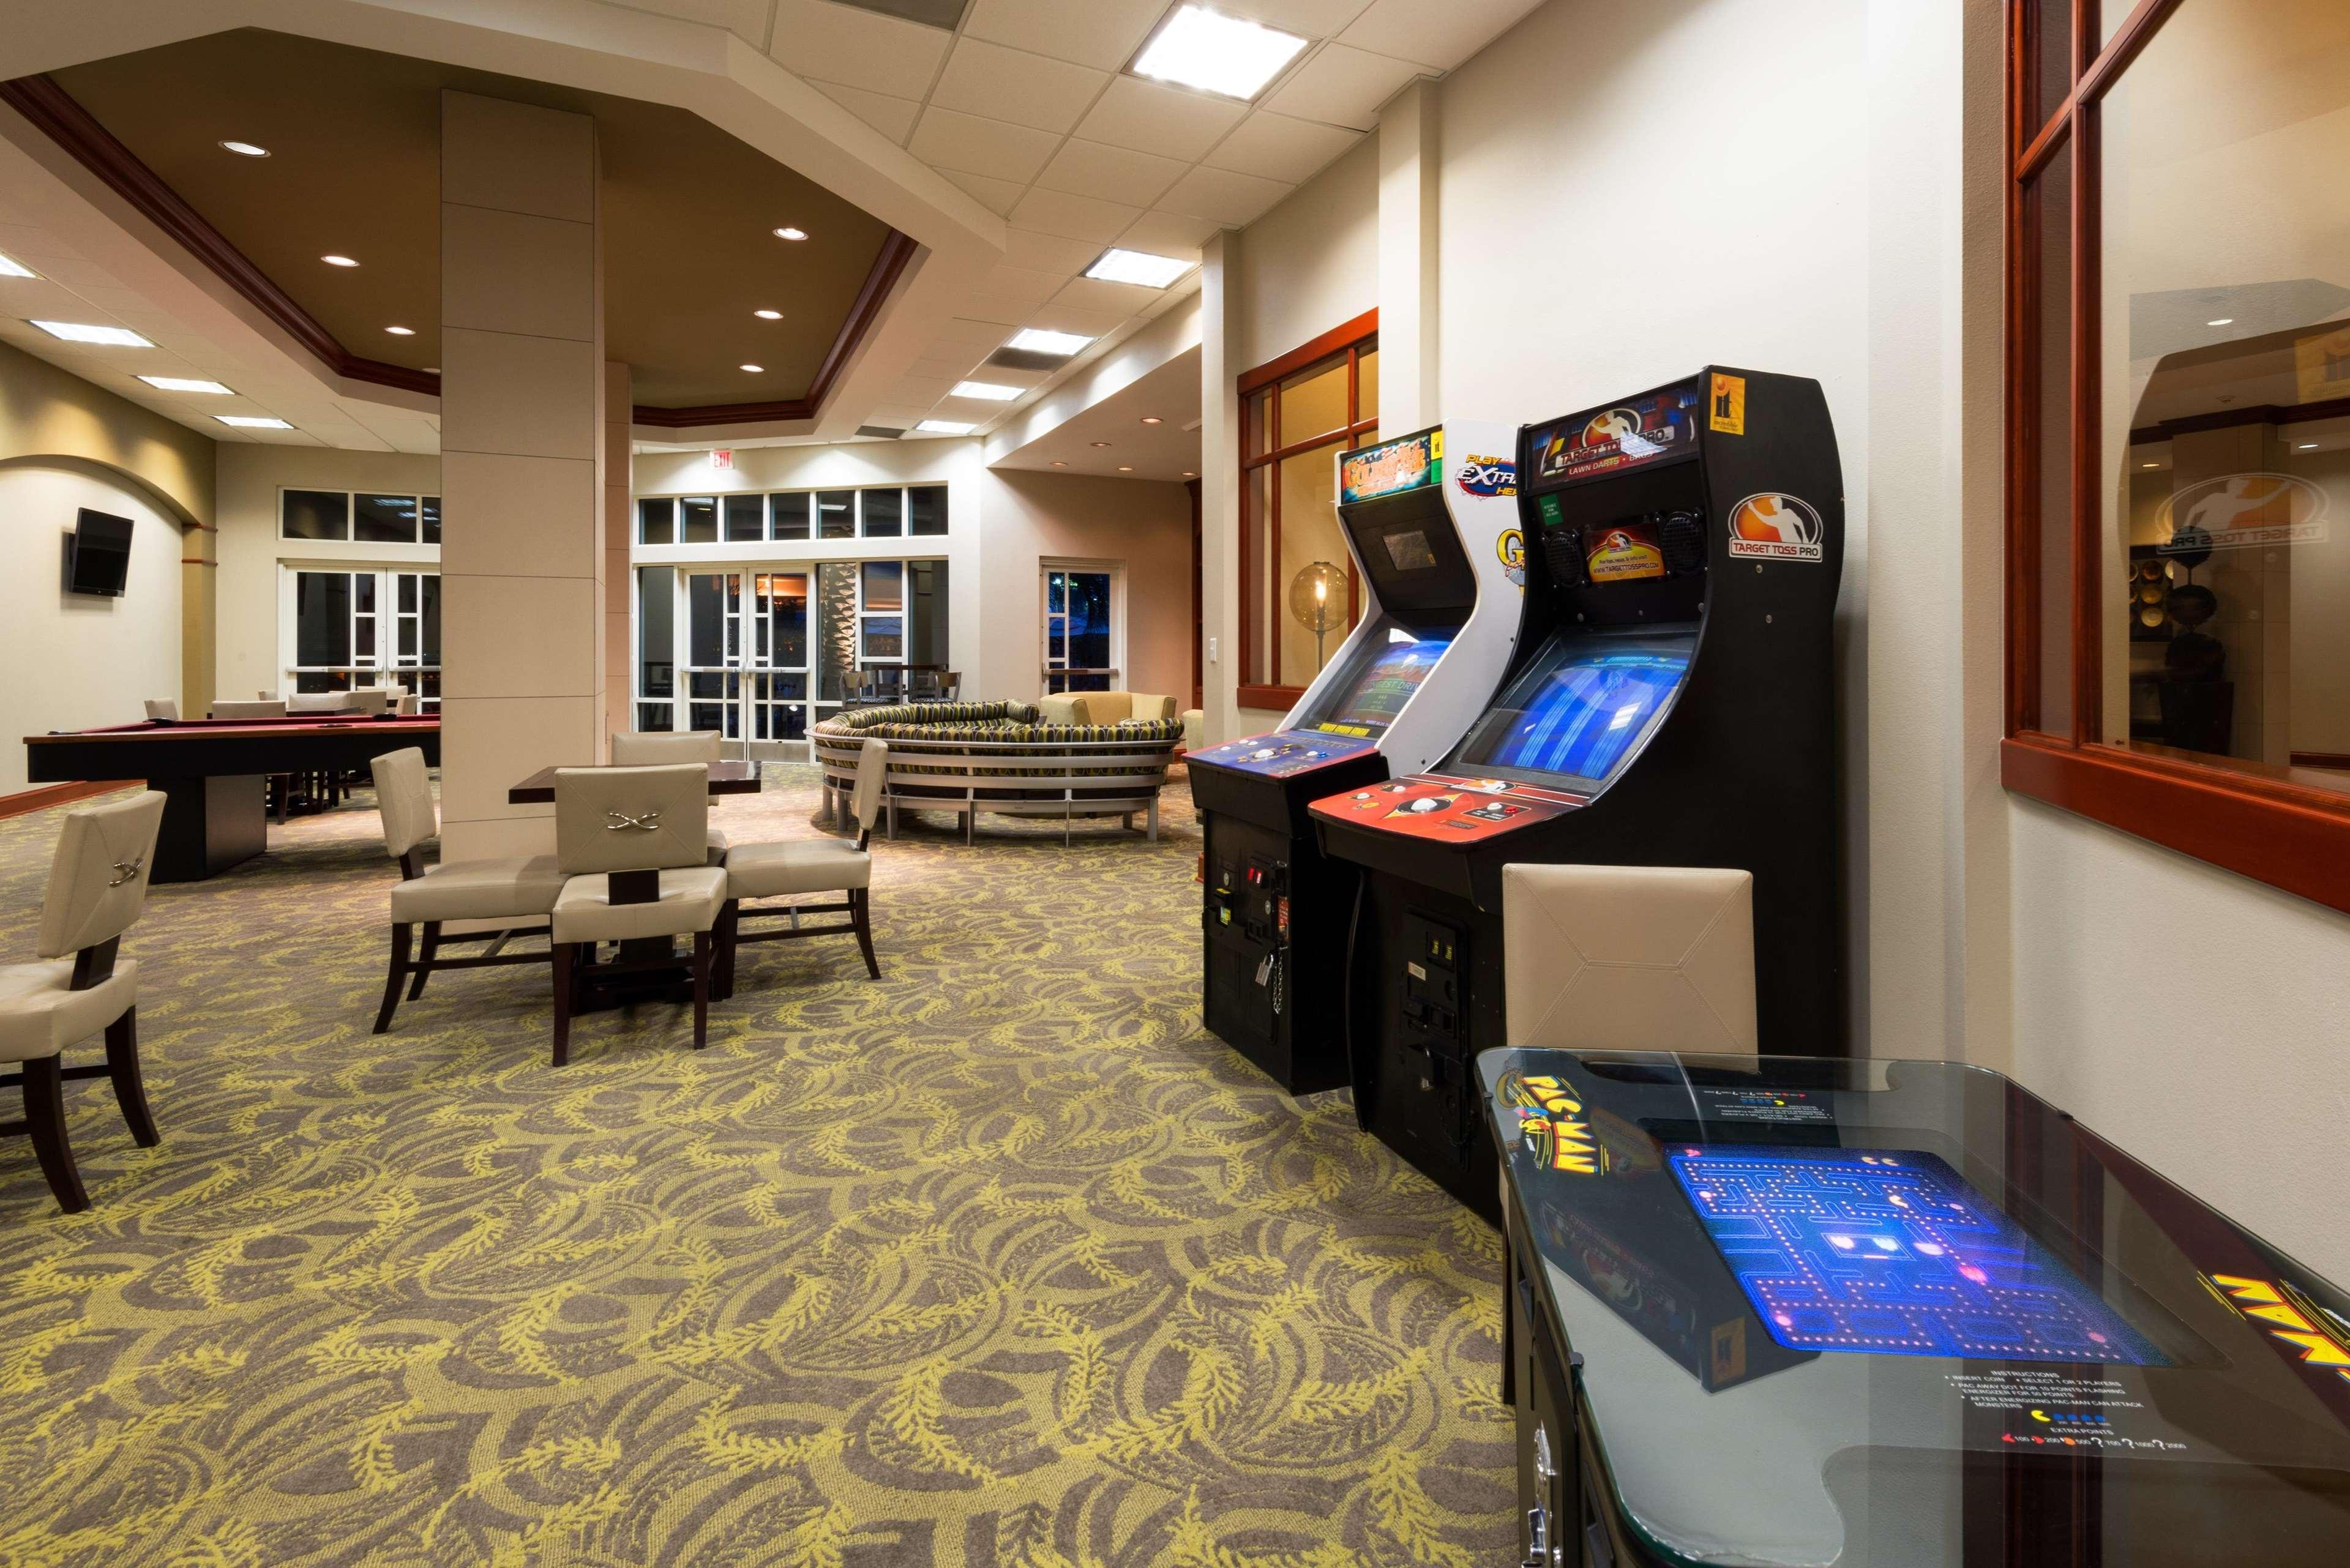 enterprise rent a car las vegas open sunday hilton grand vacations on paradise convention center. Black Bedroom Furniture Sets. Home Design Ideas